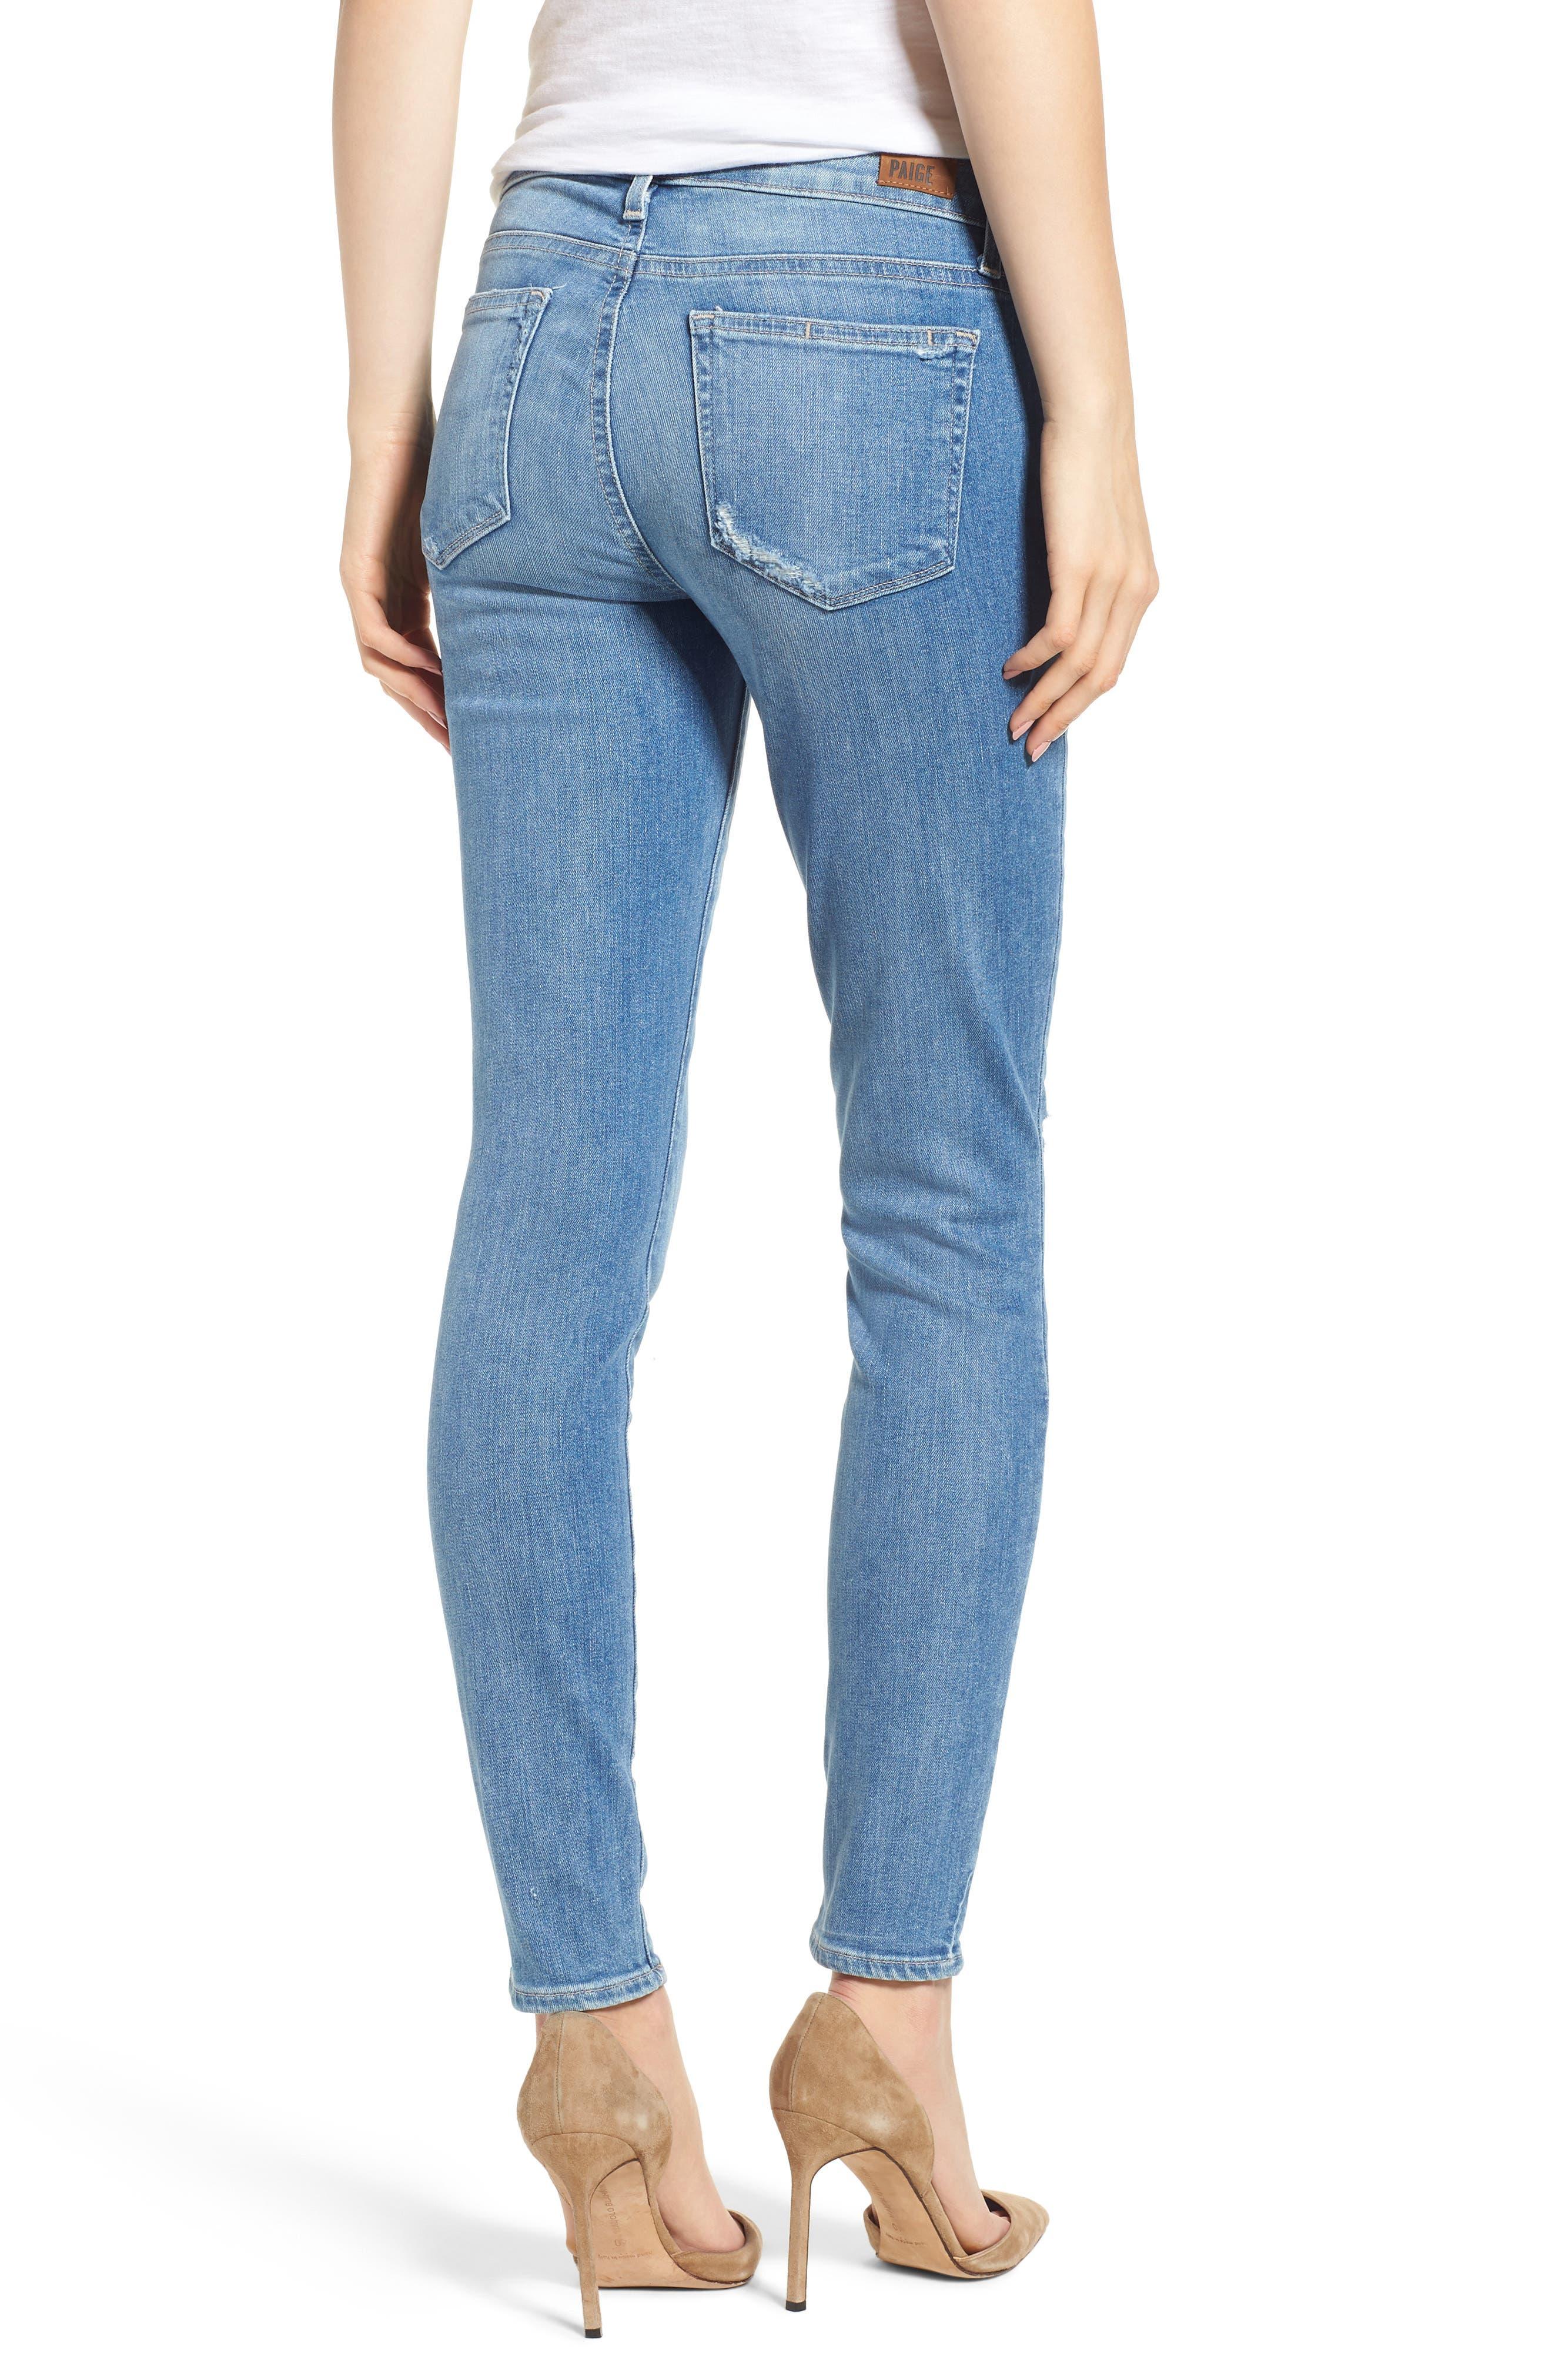 Transcend Vintage - Verdugo Ultra Skinny Jeans,                             Alternate thumbnail 2, color,                             400